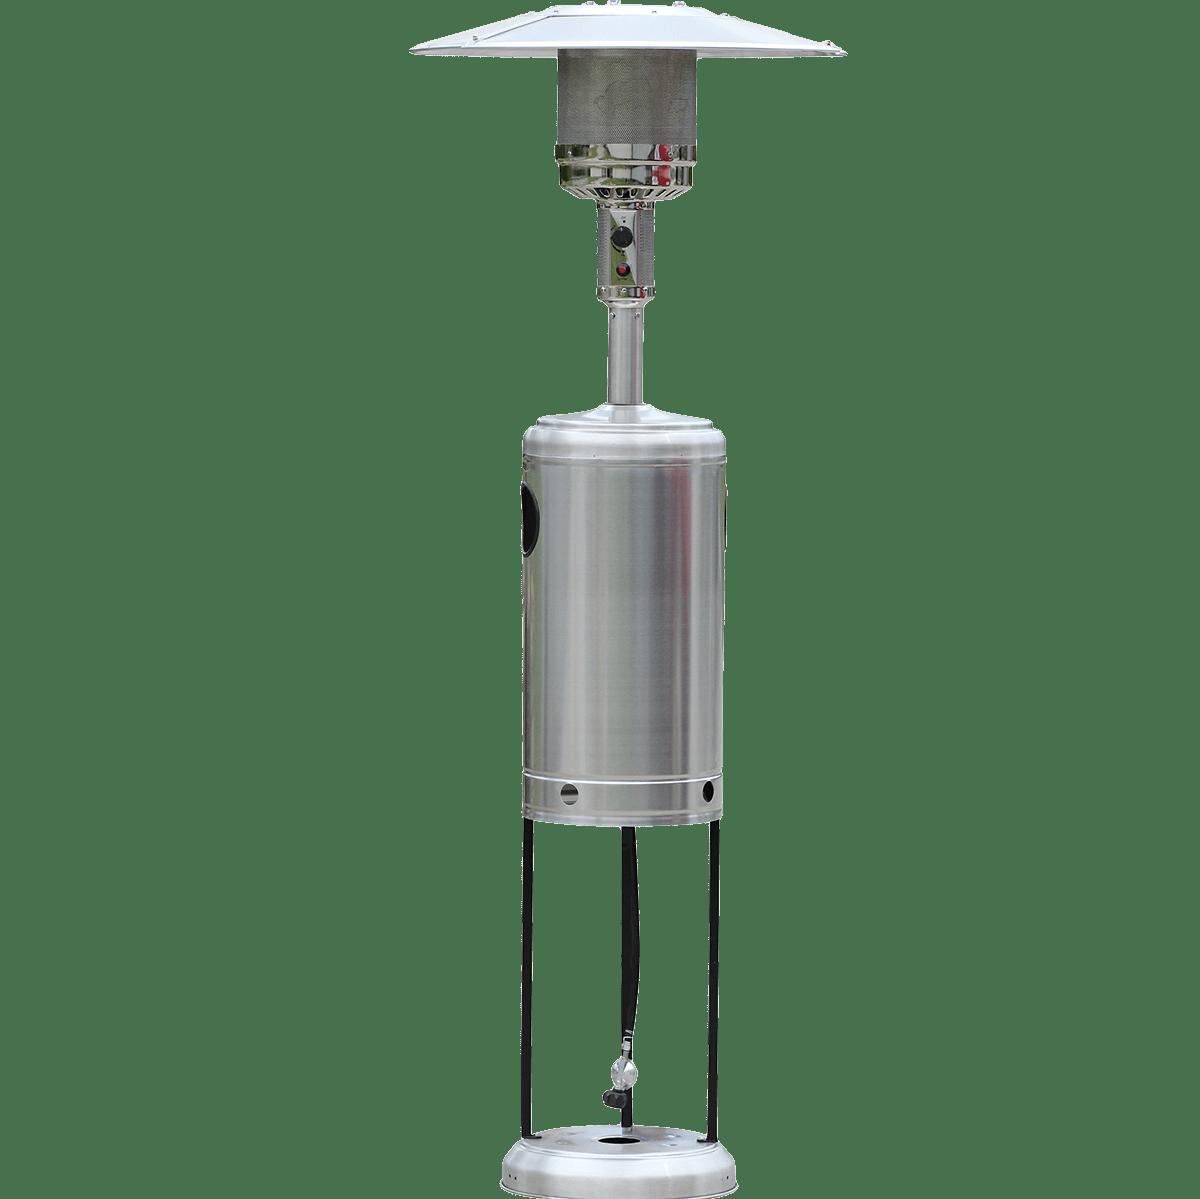 - HomComfort Stainless Steel Propane Gas Patio Heater Sylvane